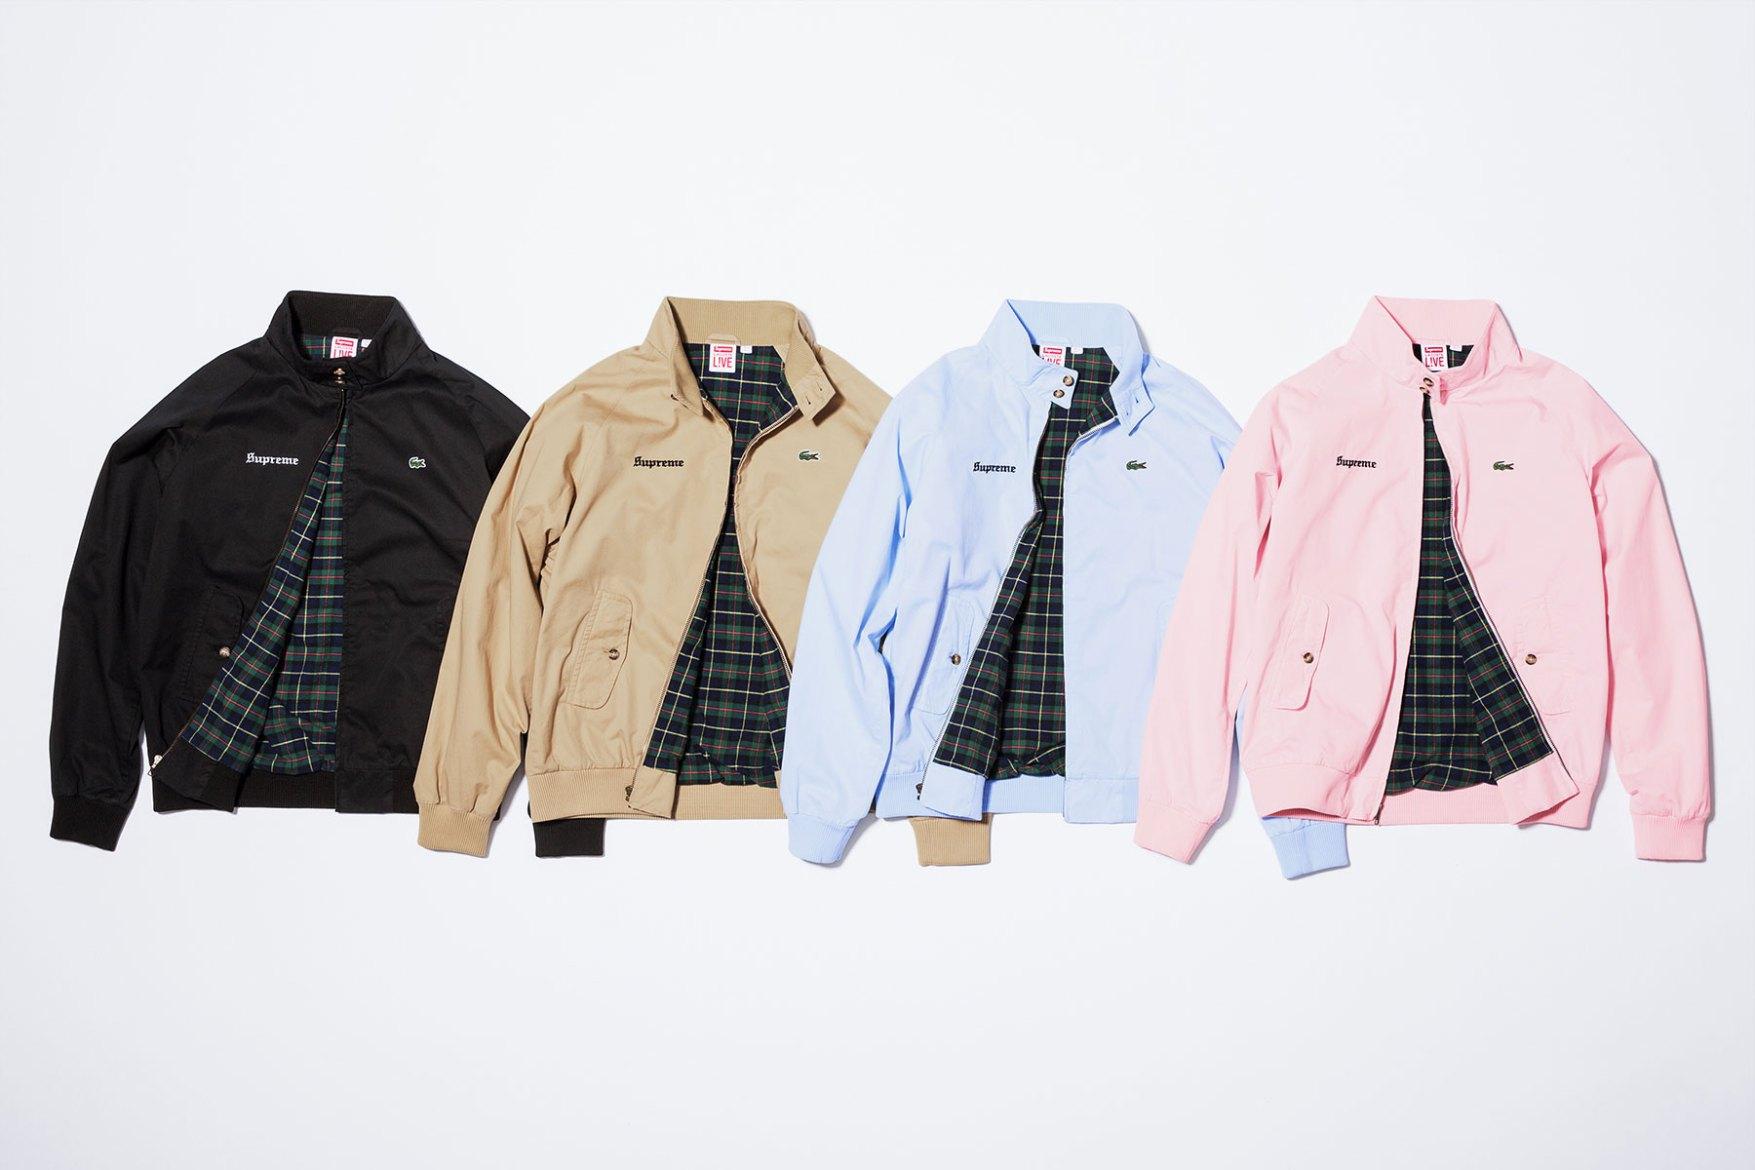 lacoste-supreme-harrington-jacket-group-2017-spring-summer-11.jpg